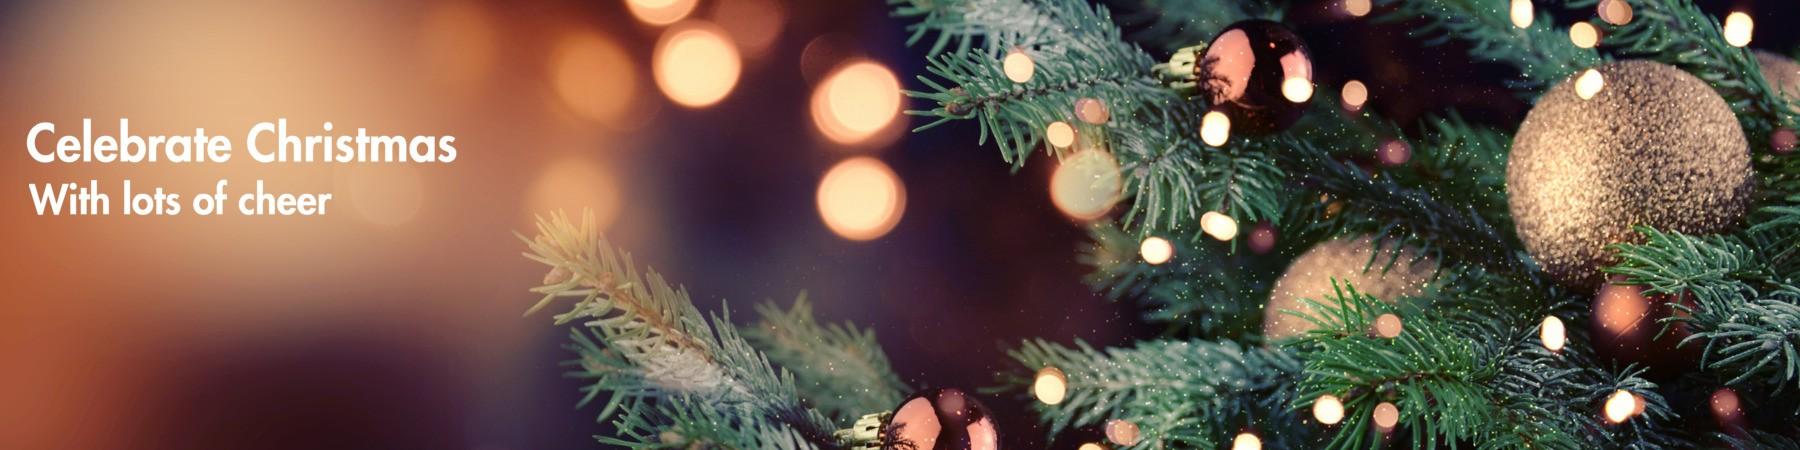 Christmas gift ideas for bachelors